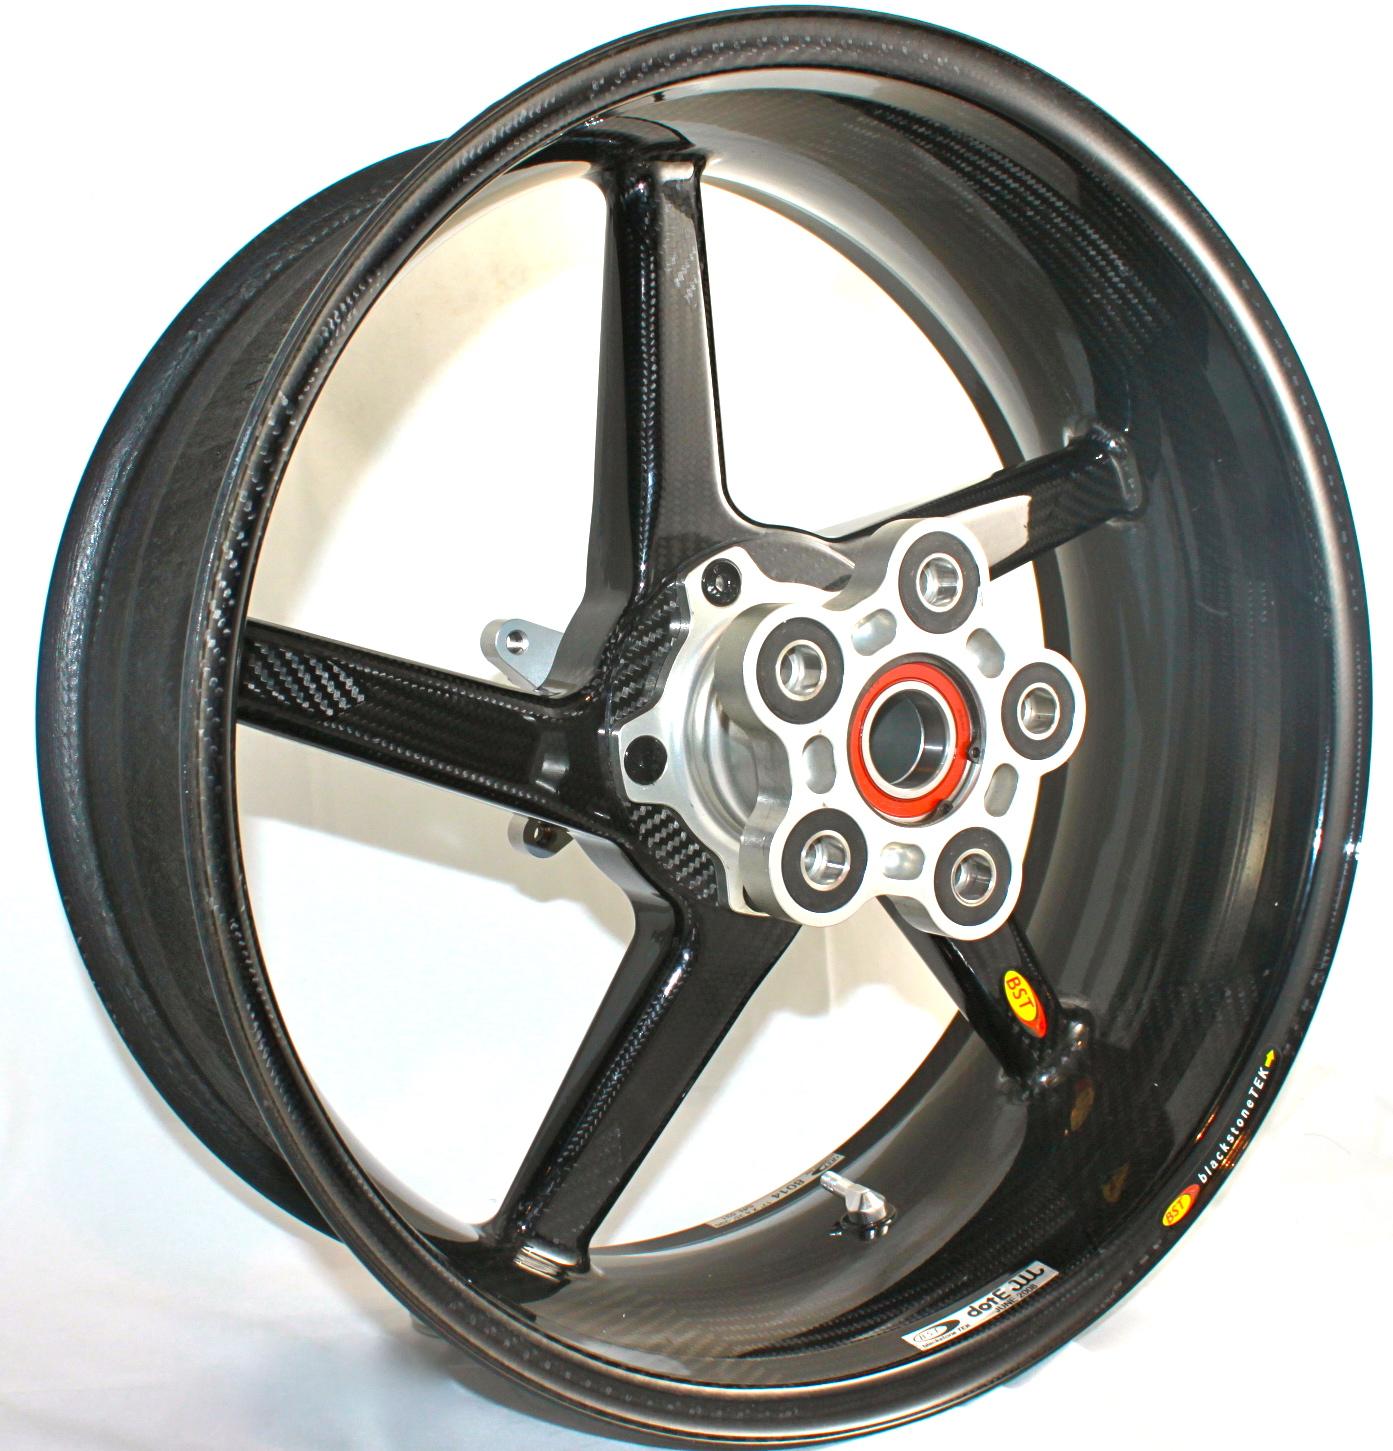 46185d1308058325-sale-bst-carbon-wheels-set-desmosedici-d16rr-img_5886.jpg